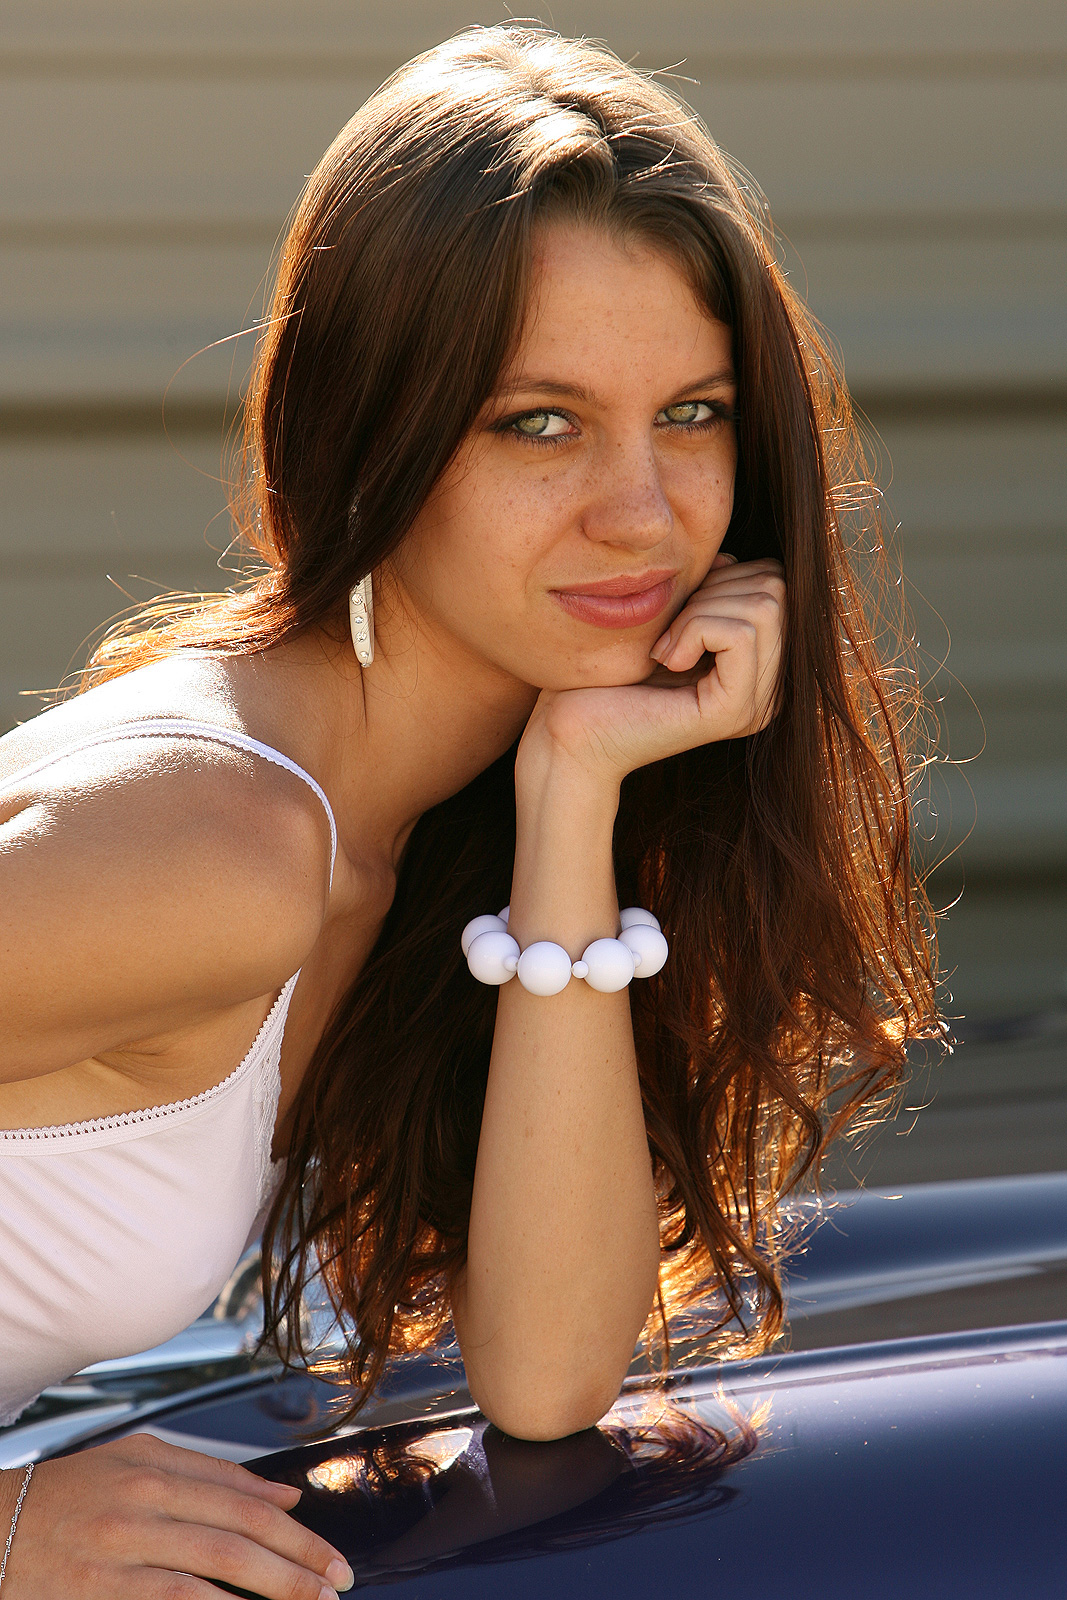 jessica-dawn-white-dress-nude-girl-car-chevrolet-bel-air-02